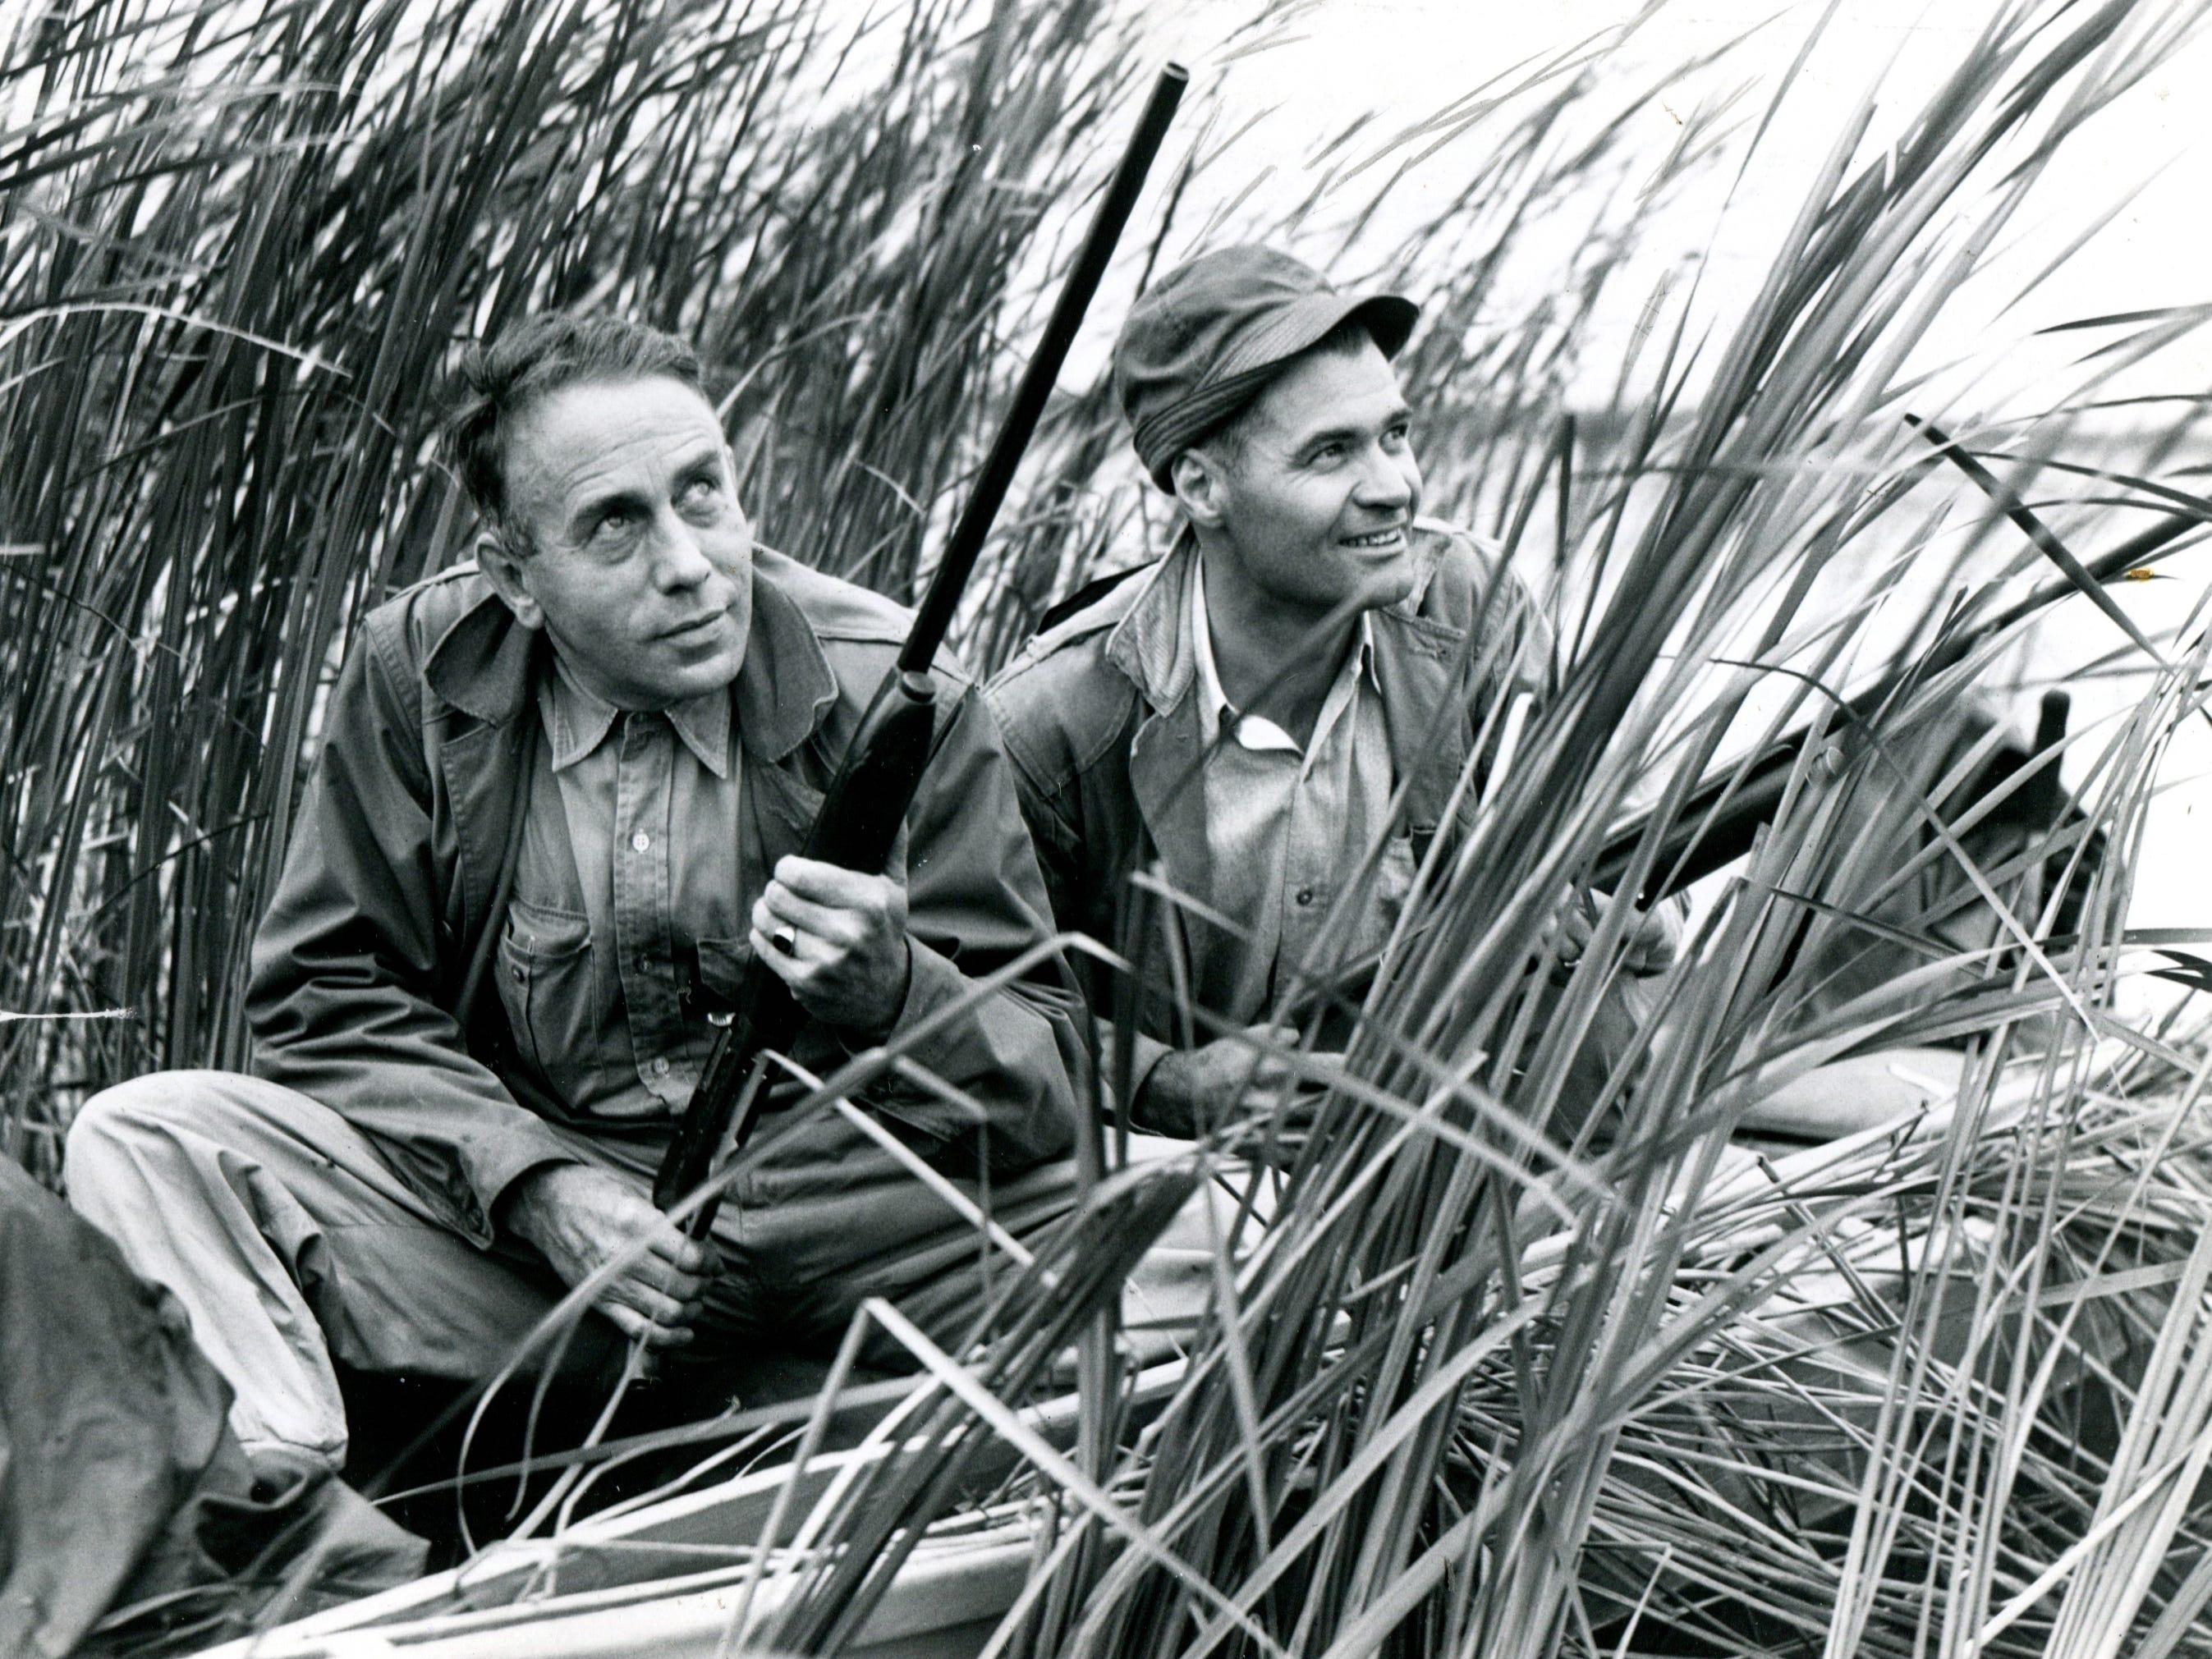 Duck hunters in Michigan await their prey on Sept. 22, 1944.